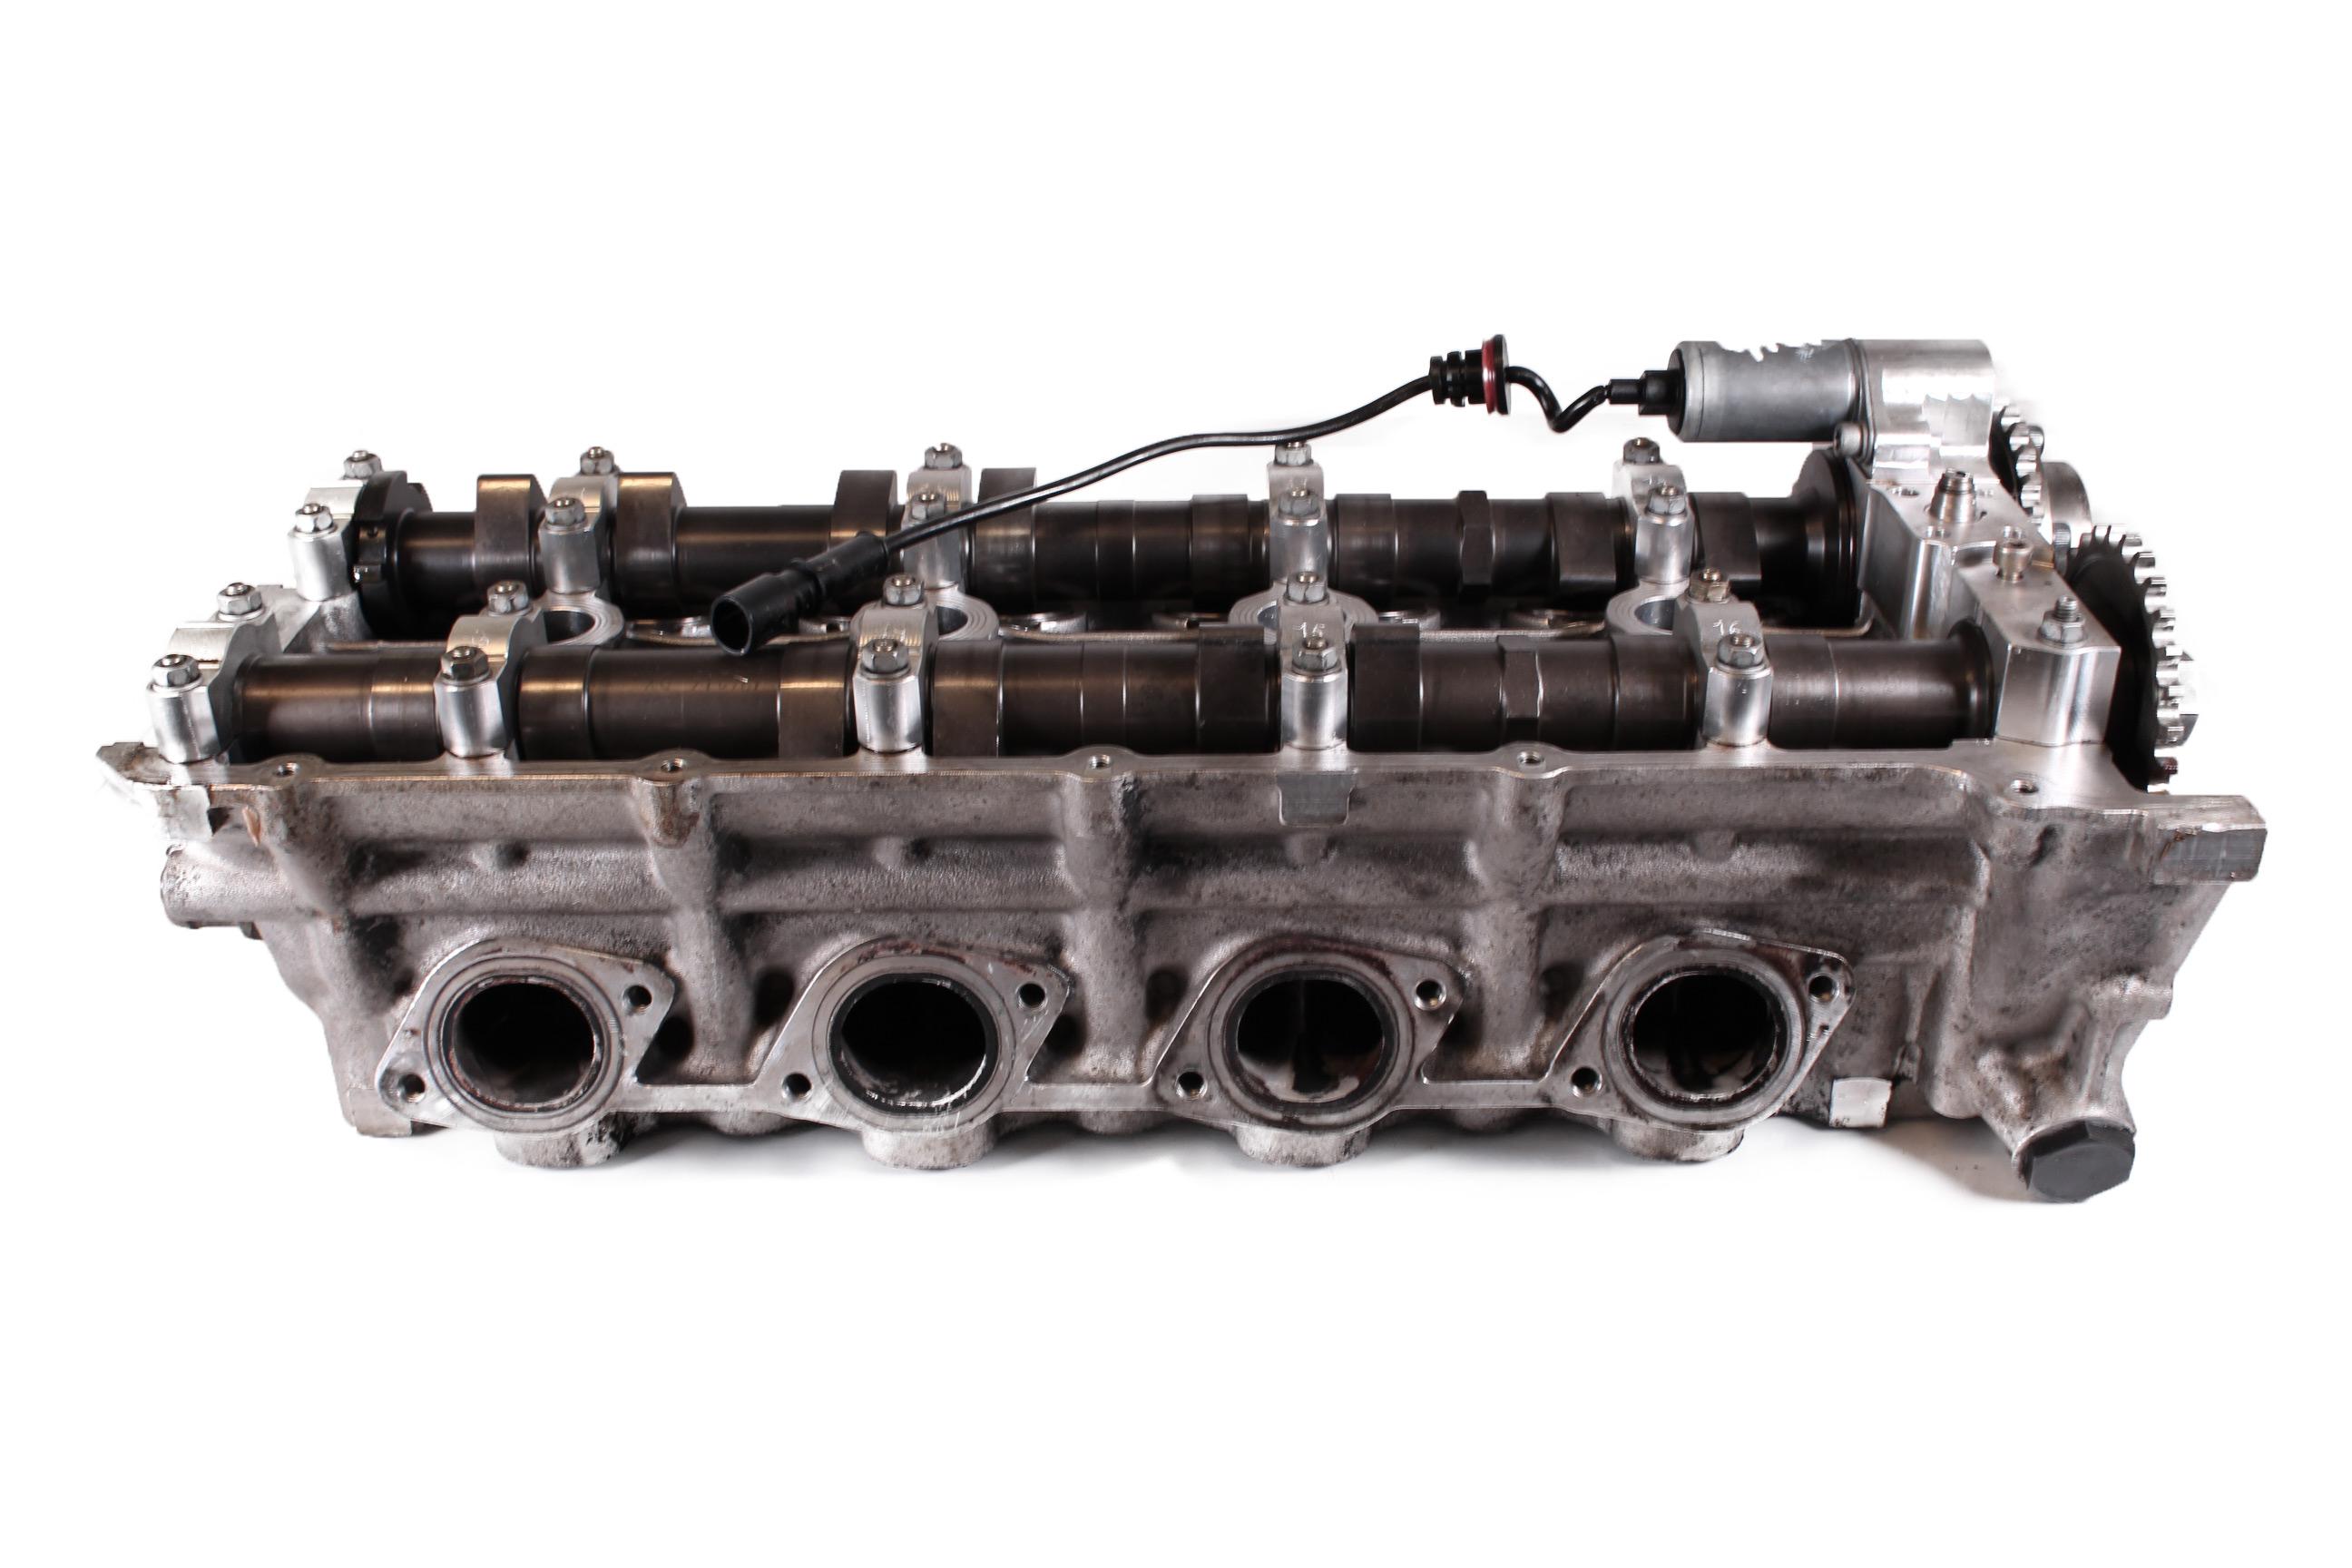 Zylinderkopf Rechts Maserati 4200 GT 4,2 490 PS 360 KW M138 V8 2184636